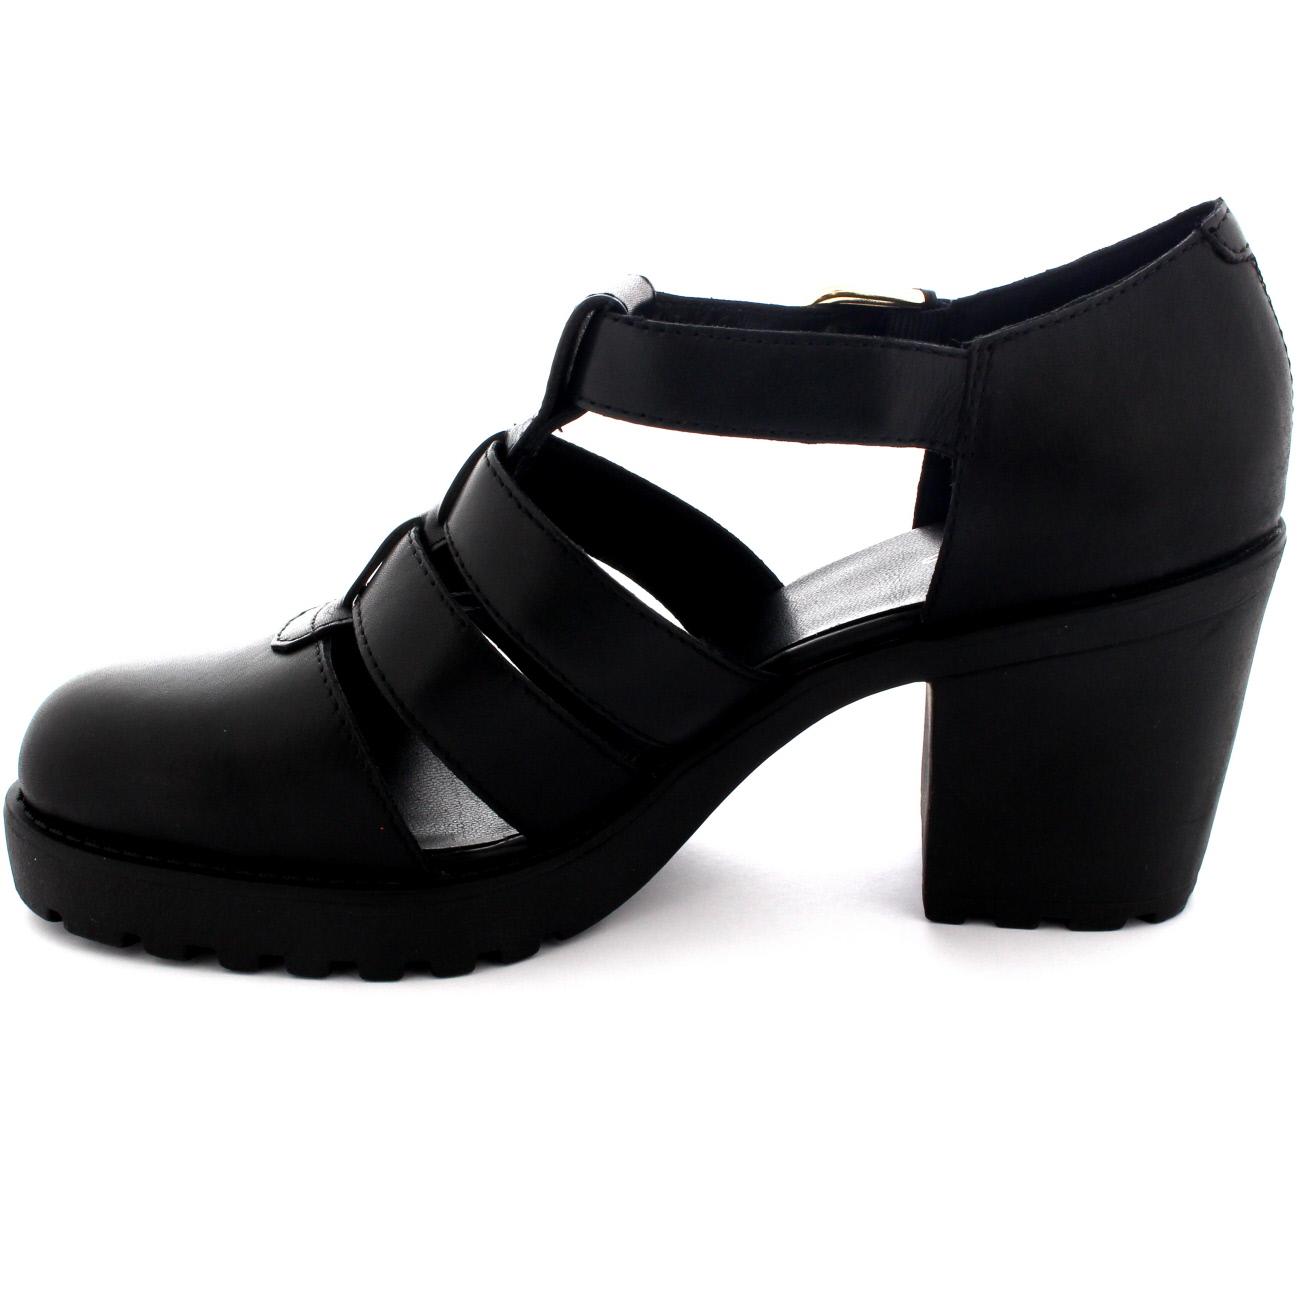 Black vagabond sandals - Womens Vagabond Grace Gladiator Festival Mid Heel Ankle